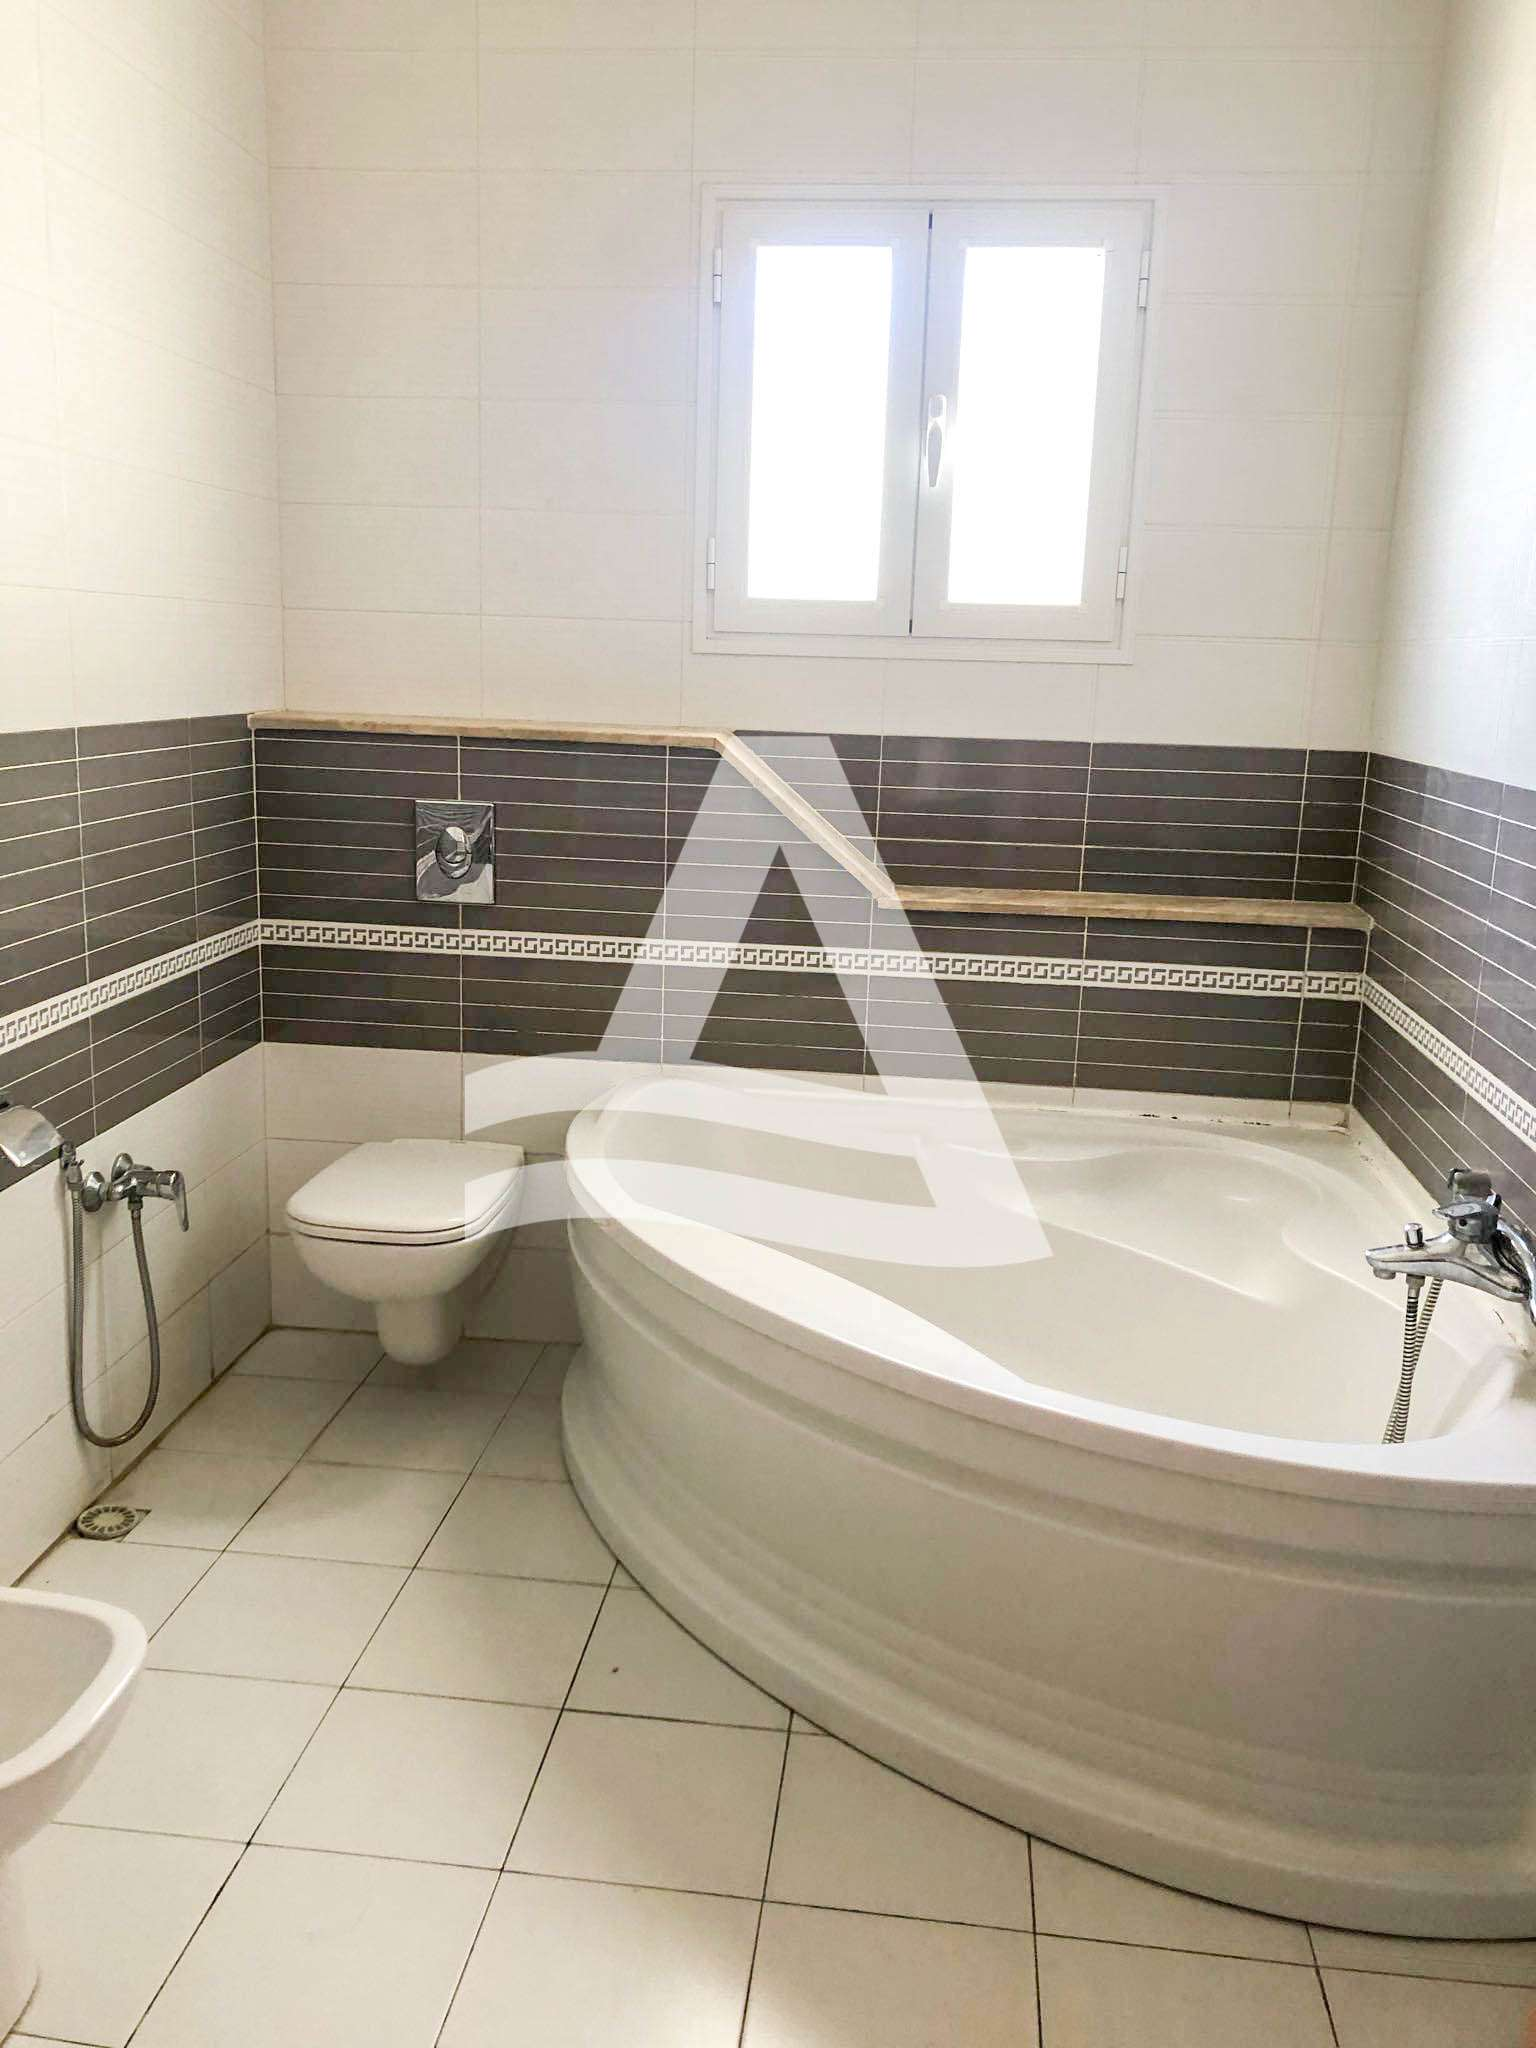 httpss3.amazonaws.comlogimoaws8245402331606832387appartement_jardin_de_carthage_5_sur_12